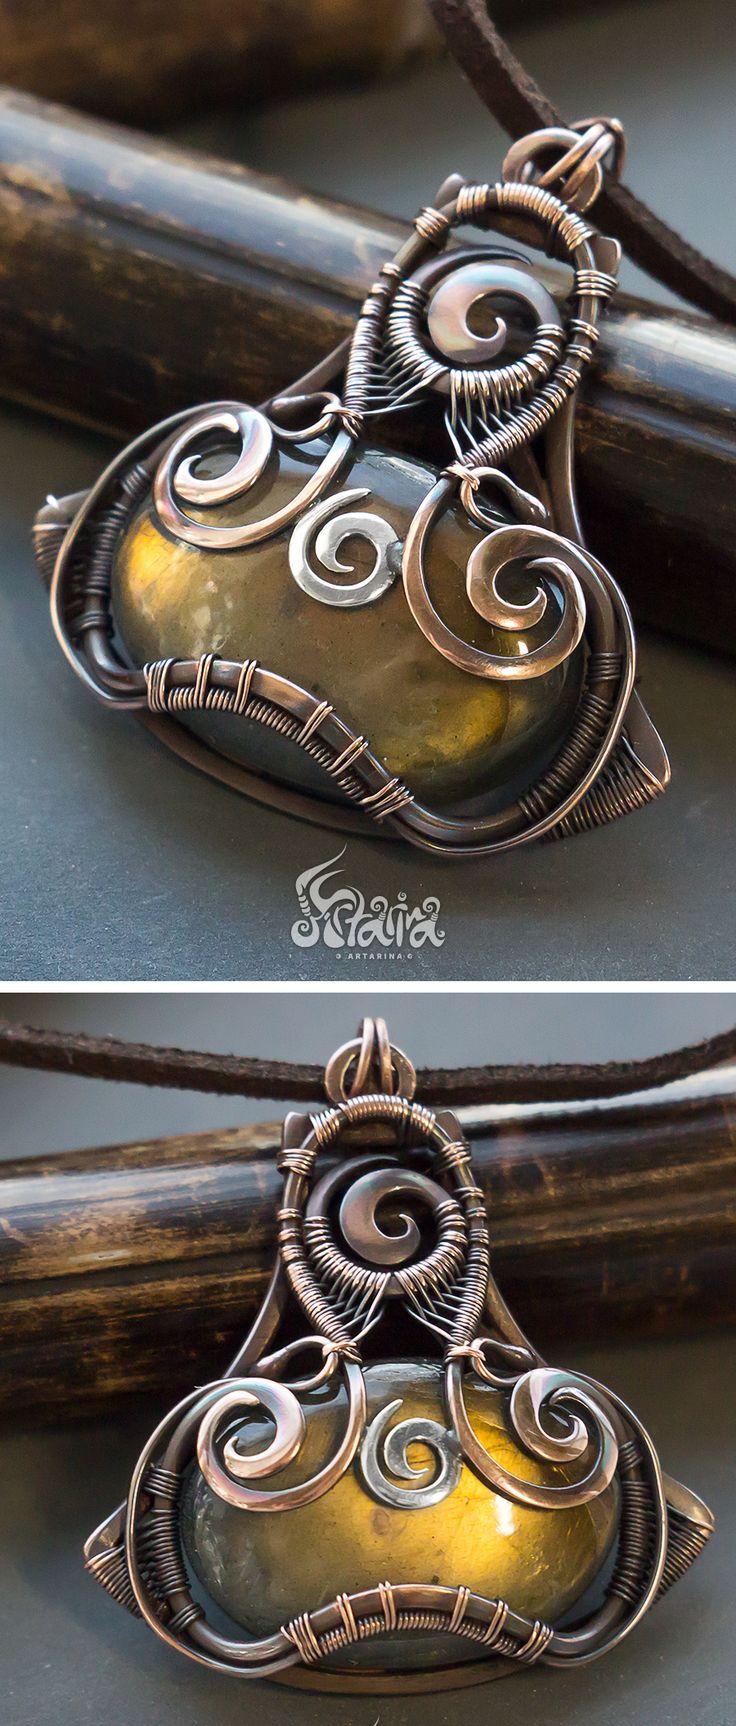 Copper wire wrapped pendant with labradorite